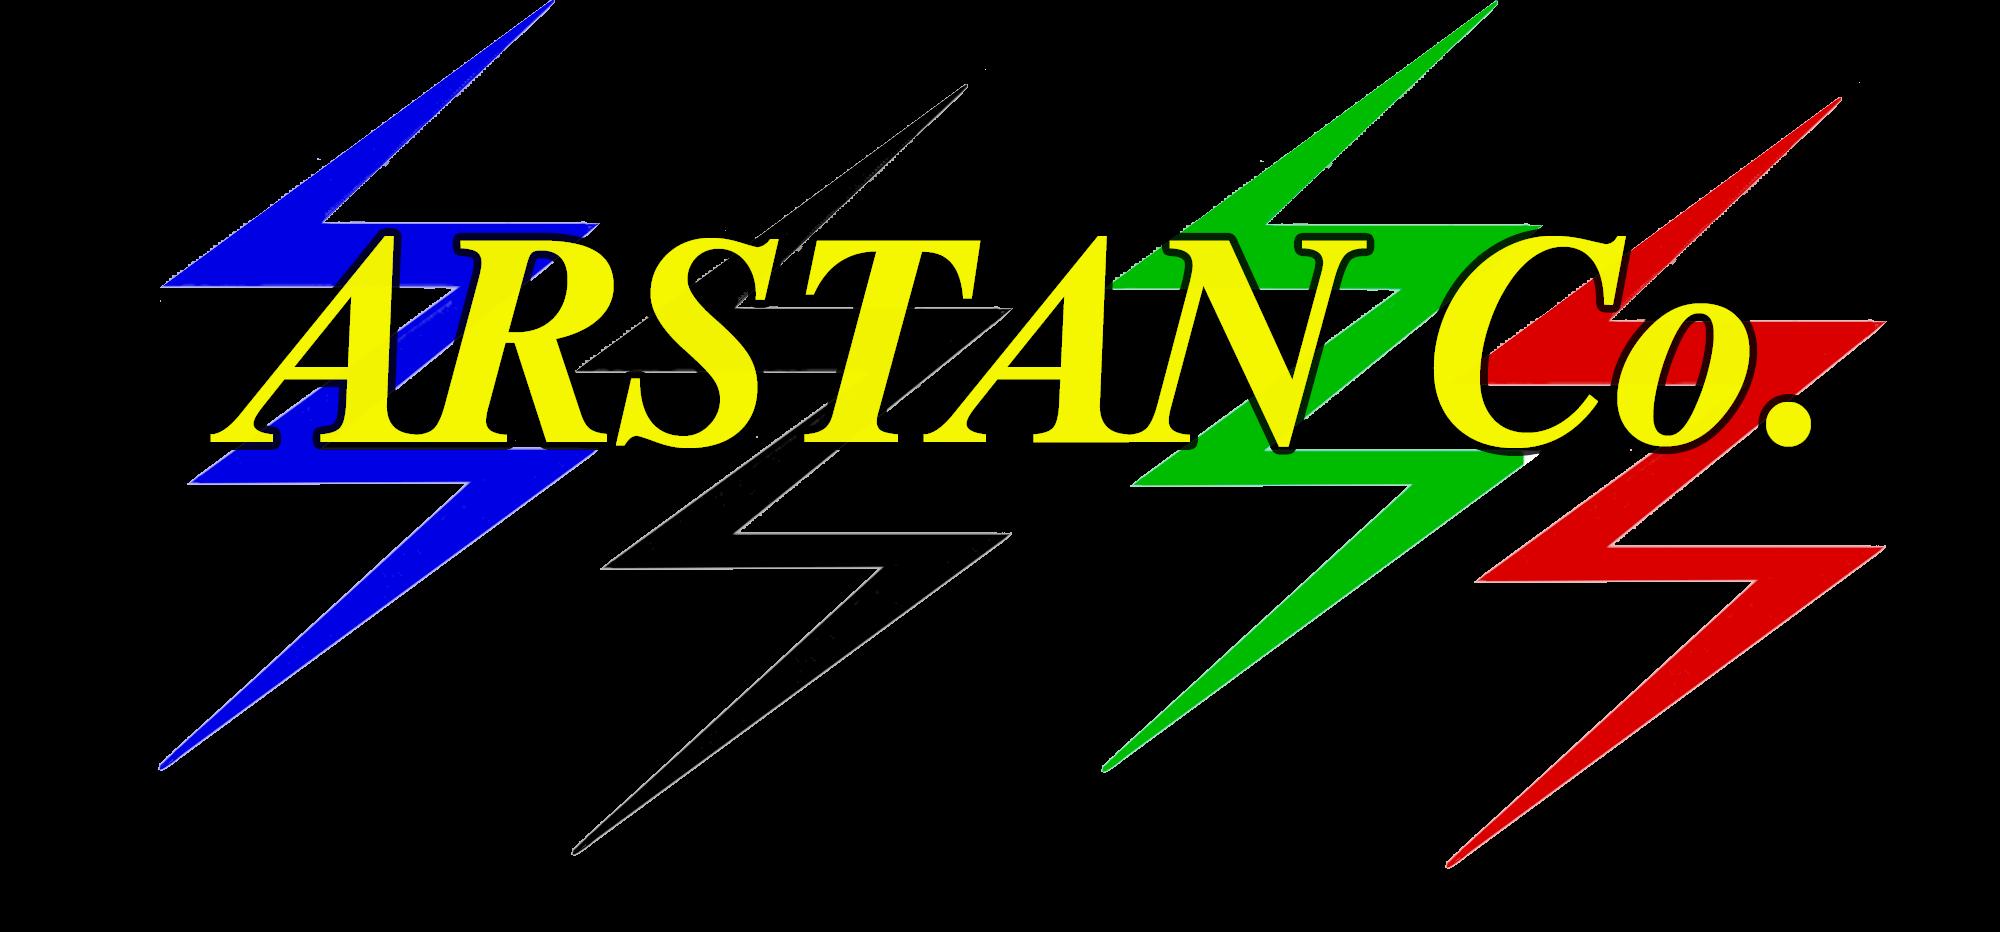 Arstan